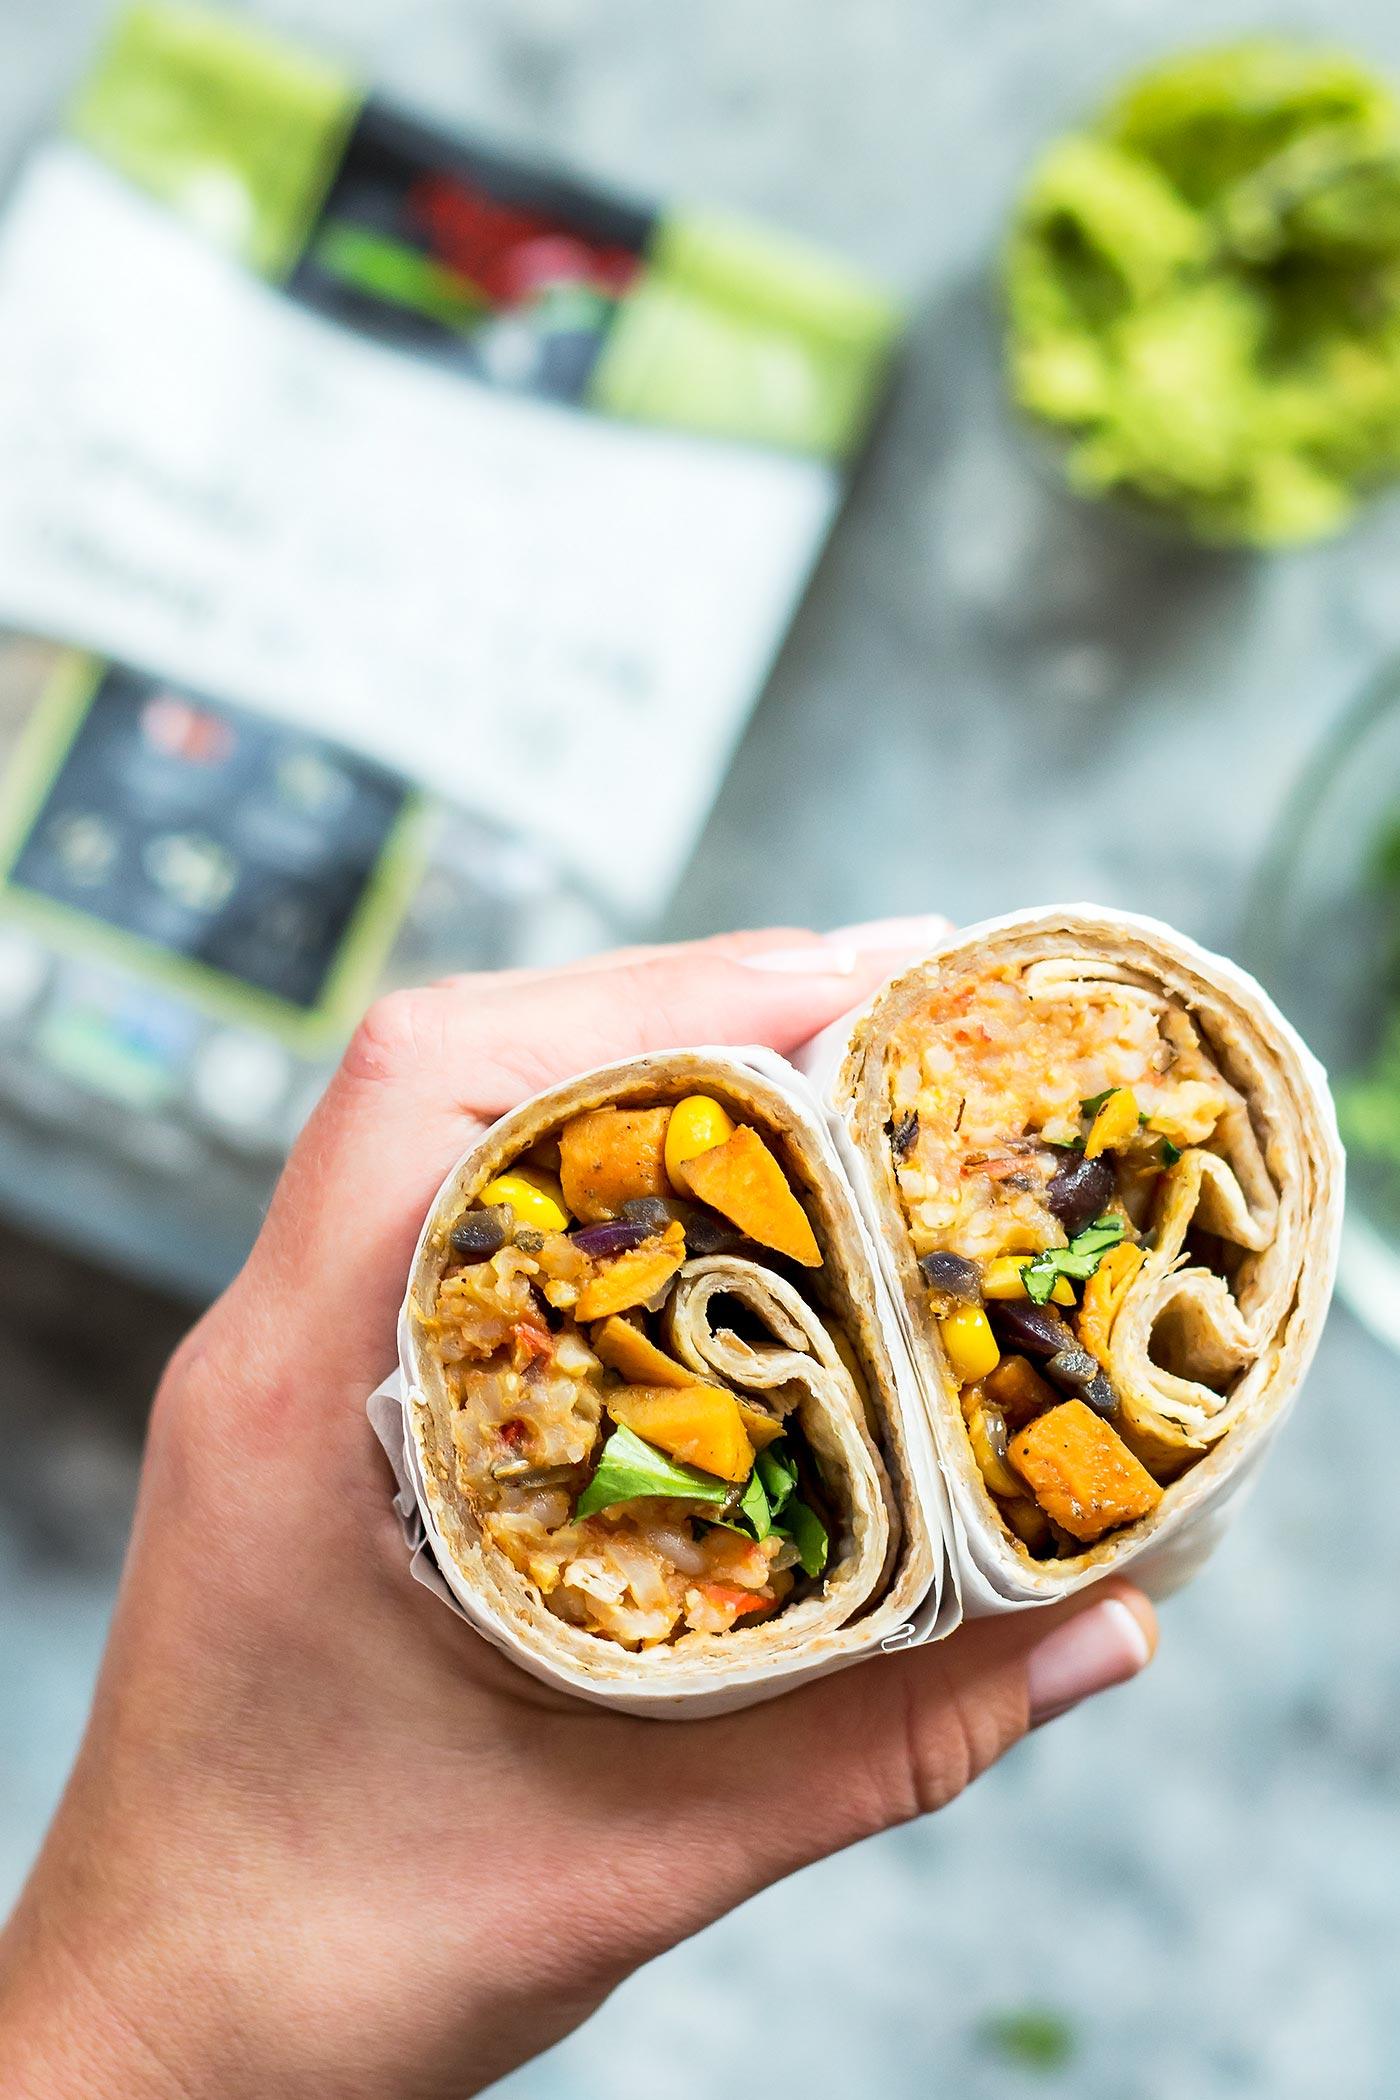 Holding two vegan burrito halves